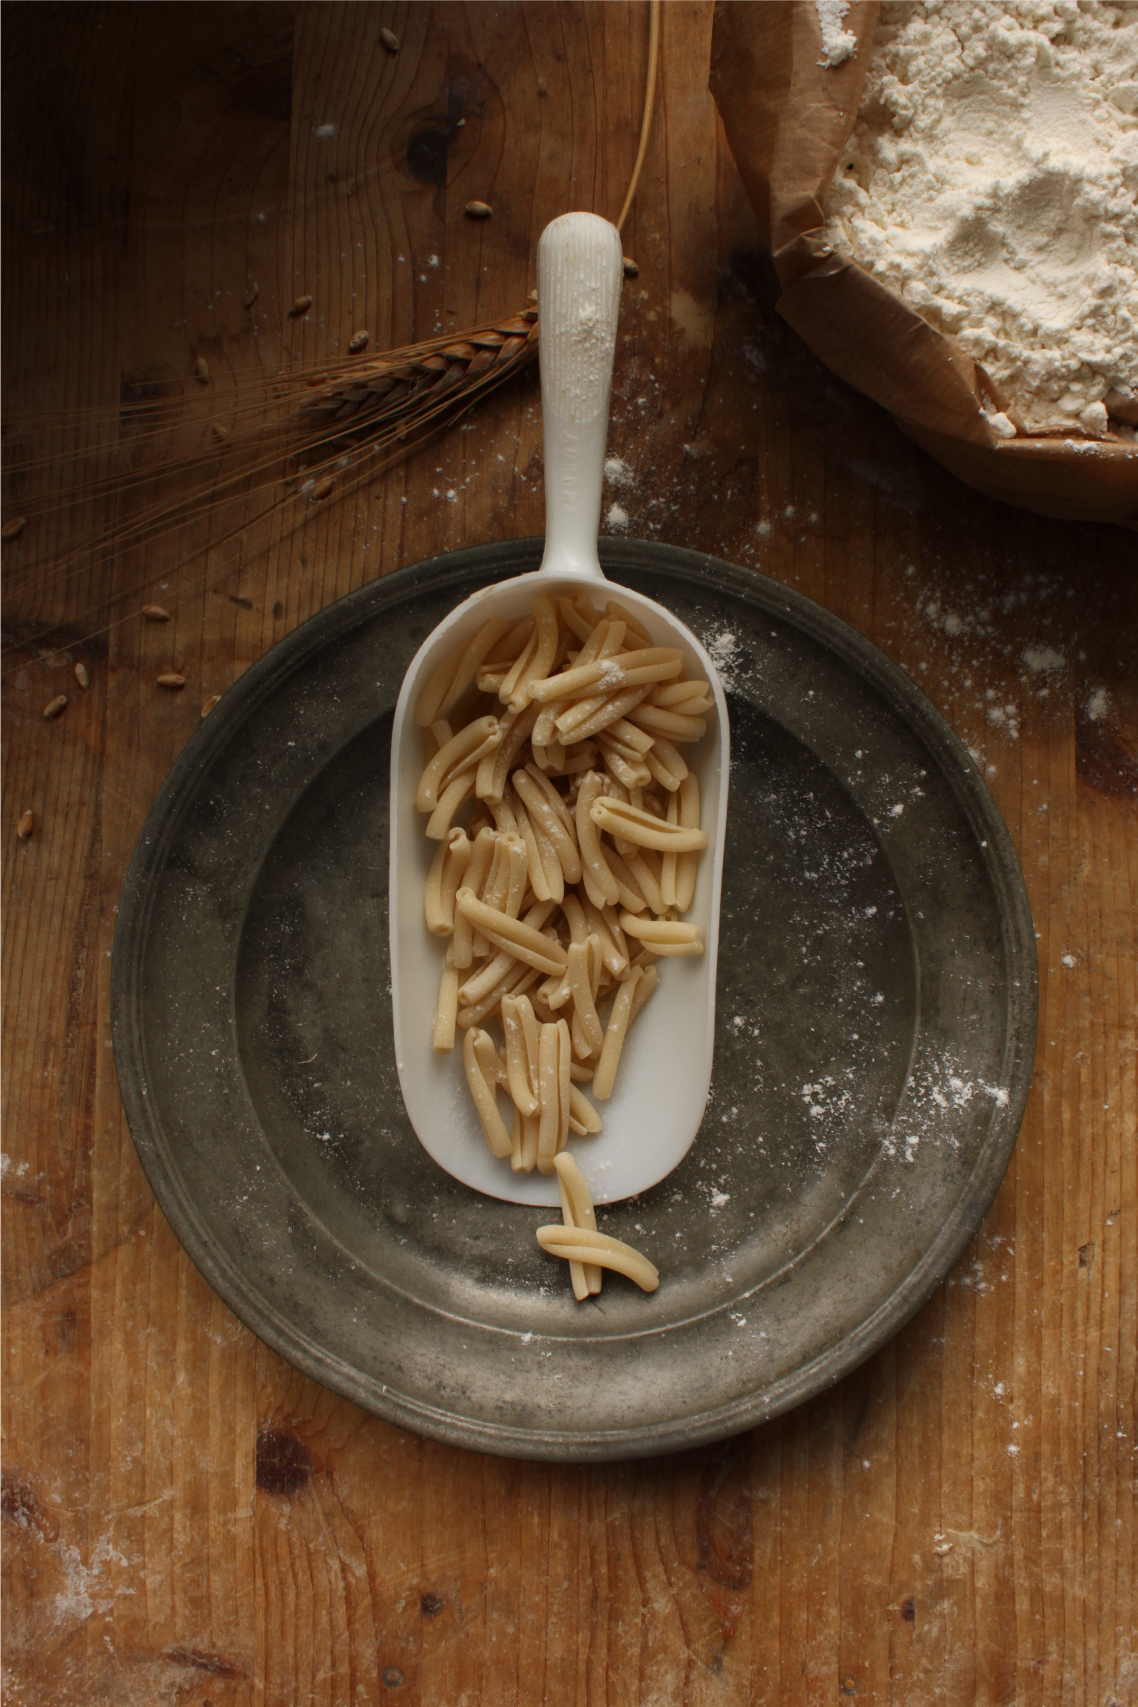 Food  styling  photo foodporn milan Italy milano Tuscany recipe photographer chef italian Blog foodstyling MADEINITALY